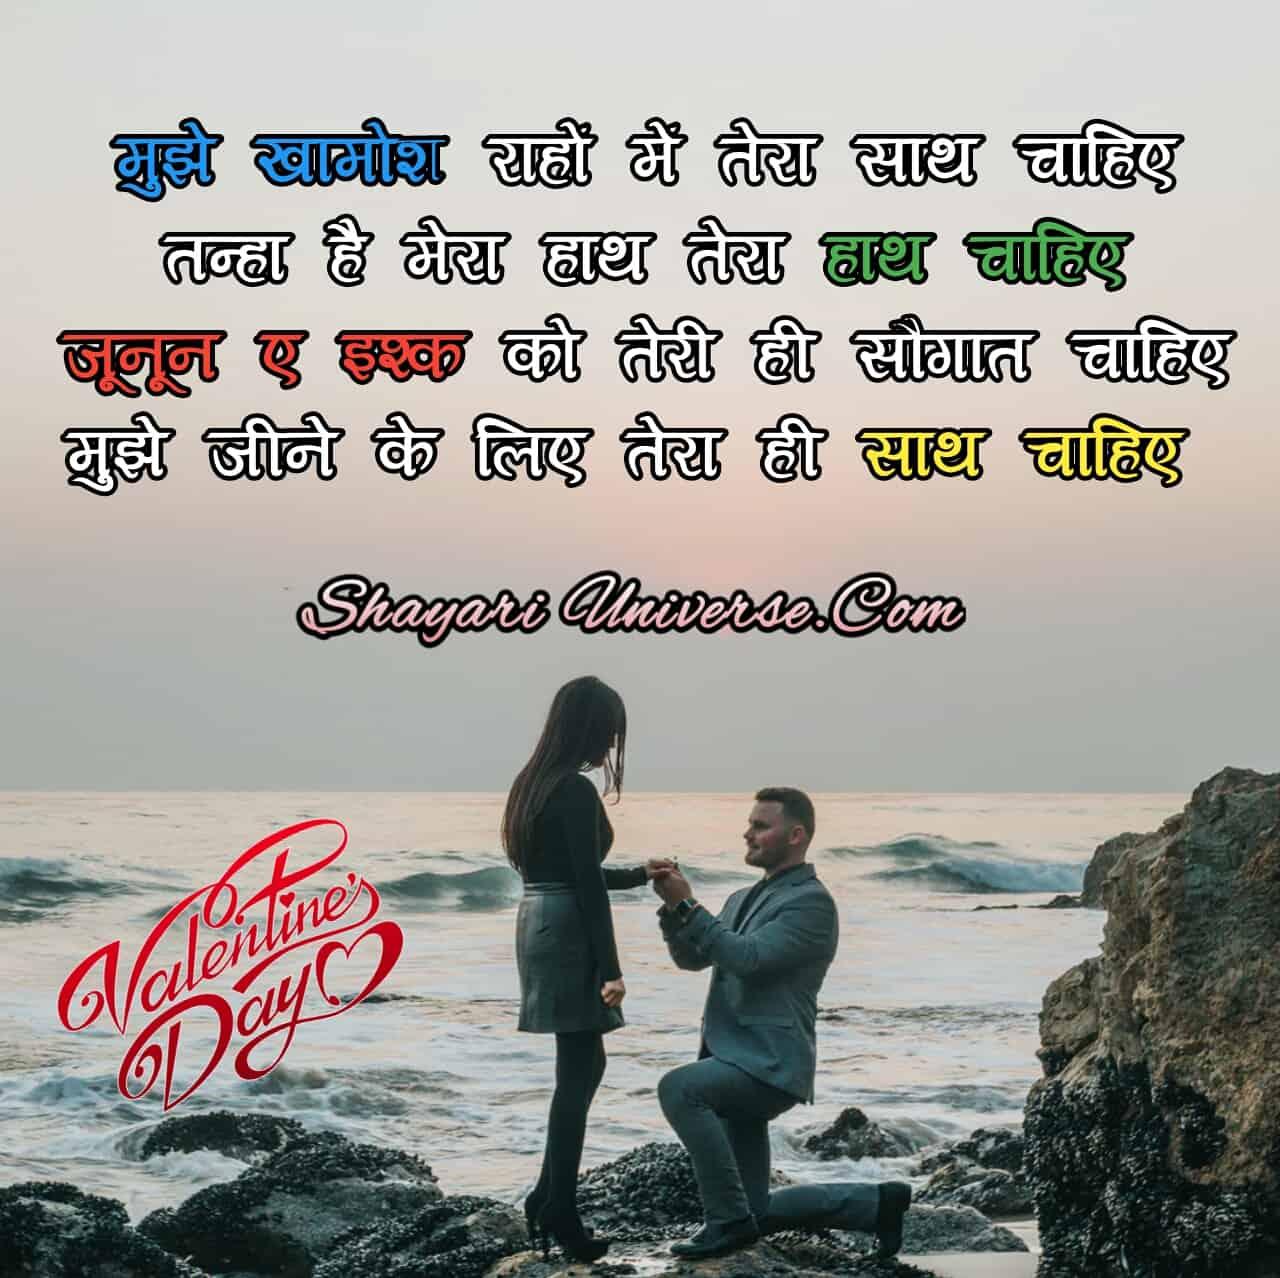 Happy Valentines Day Shayari for Her